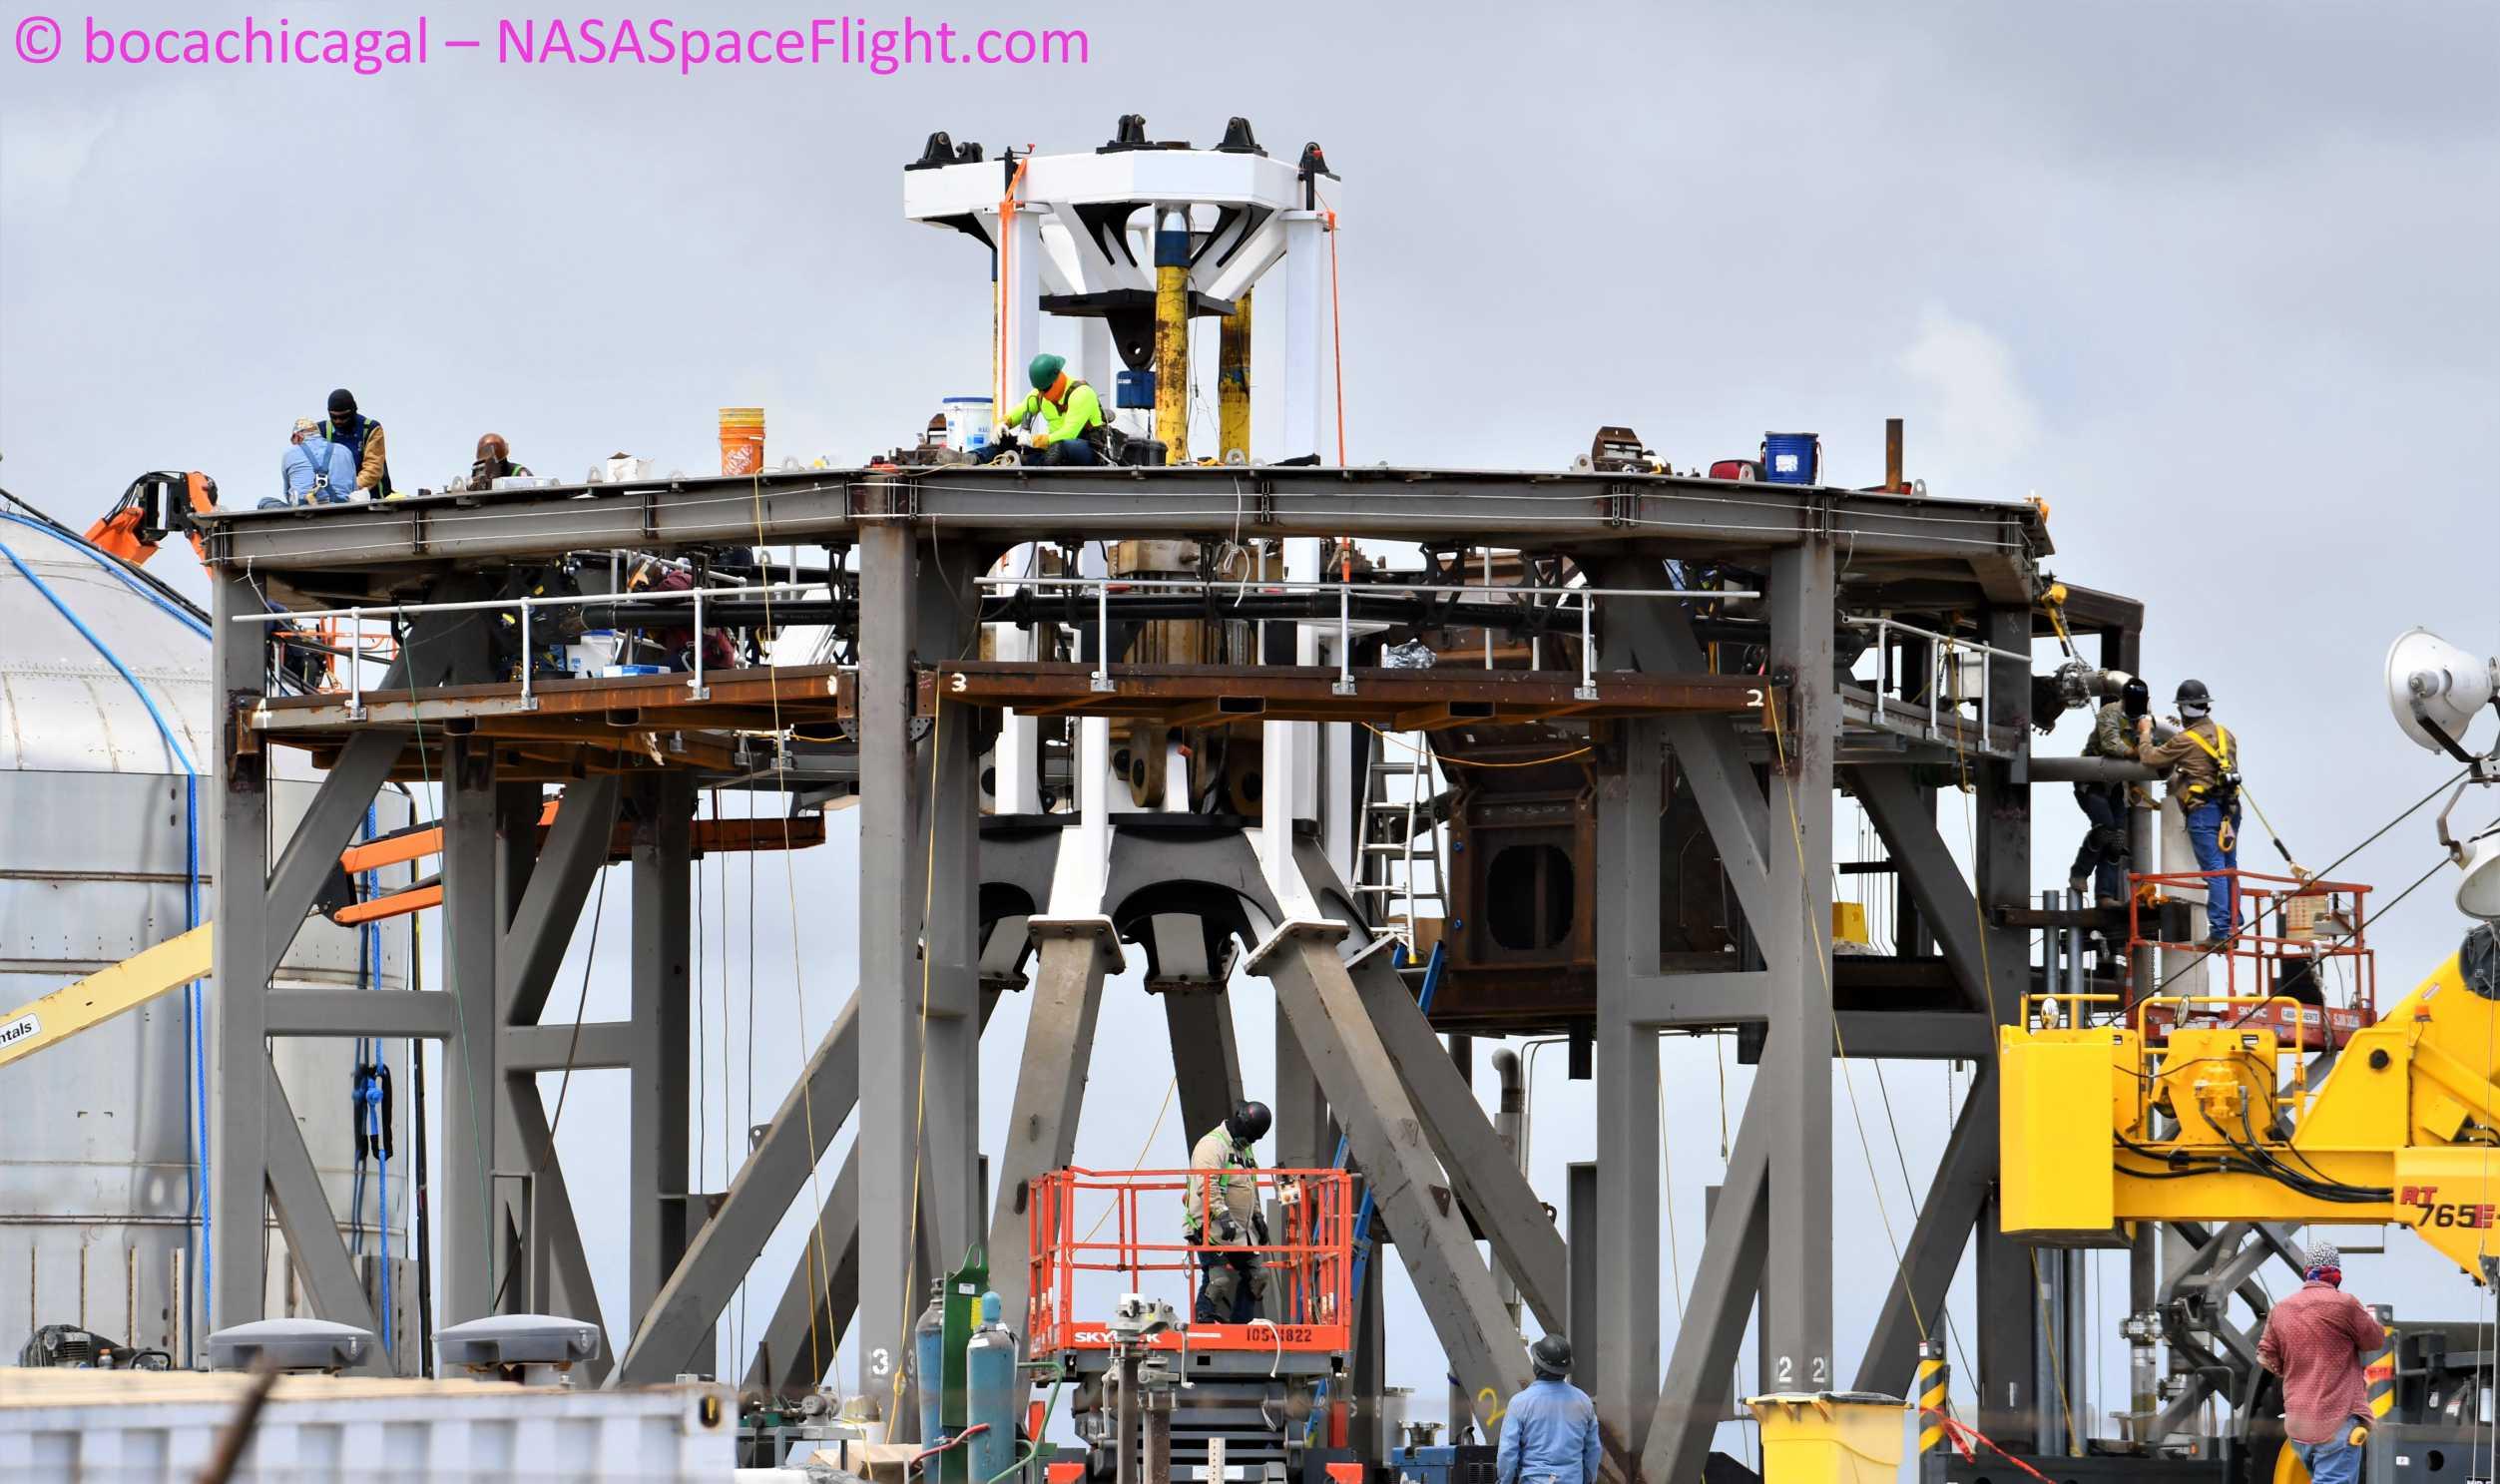 Starship Boca Chica 061920 (NASASpaceflight – bocachicagal) mount work 1 crop (c)